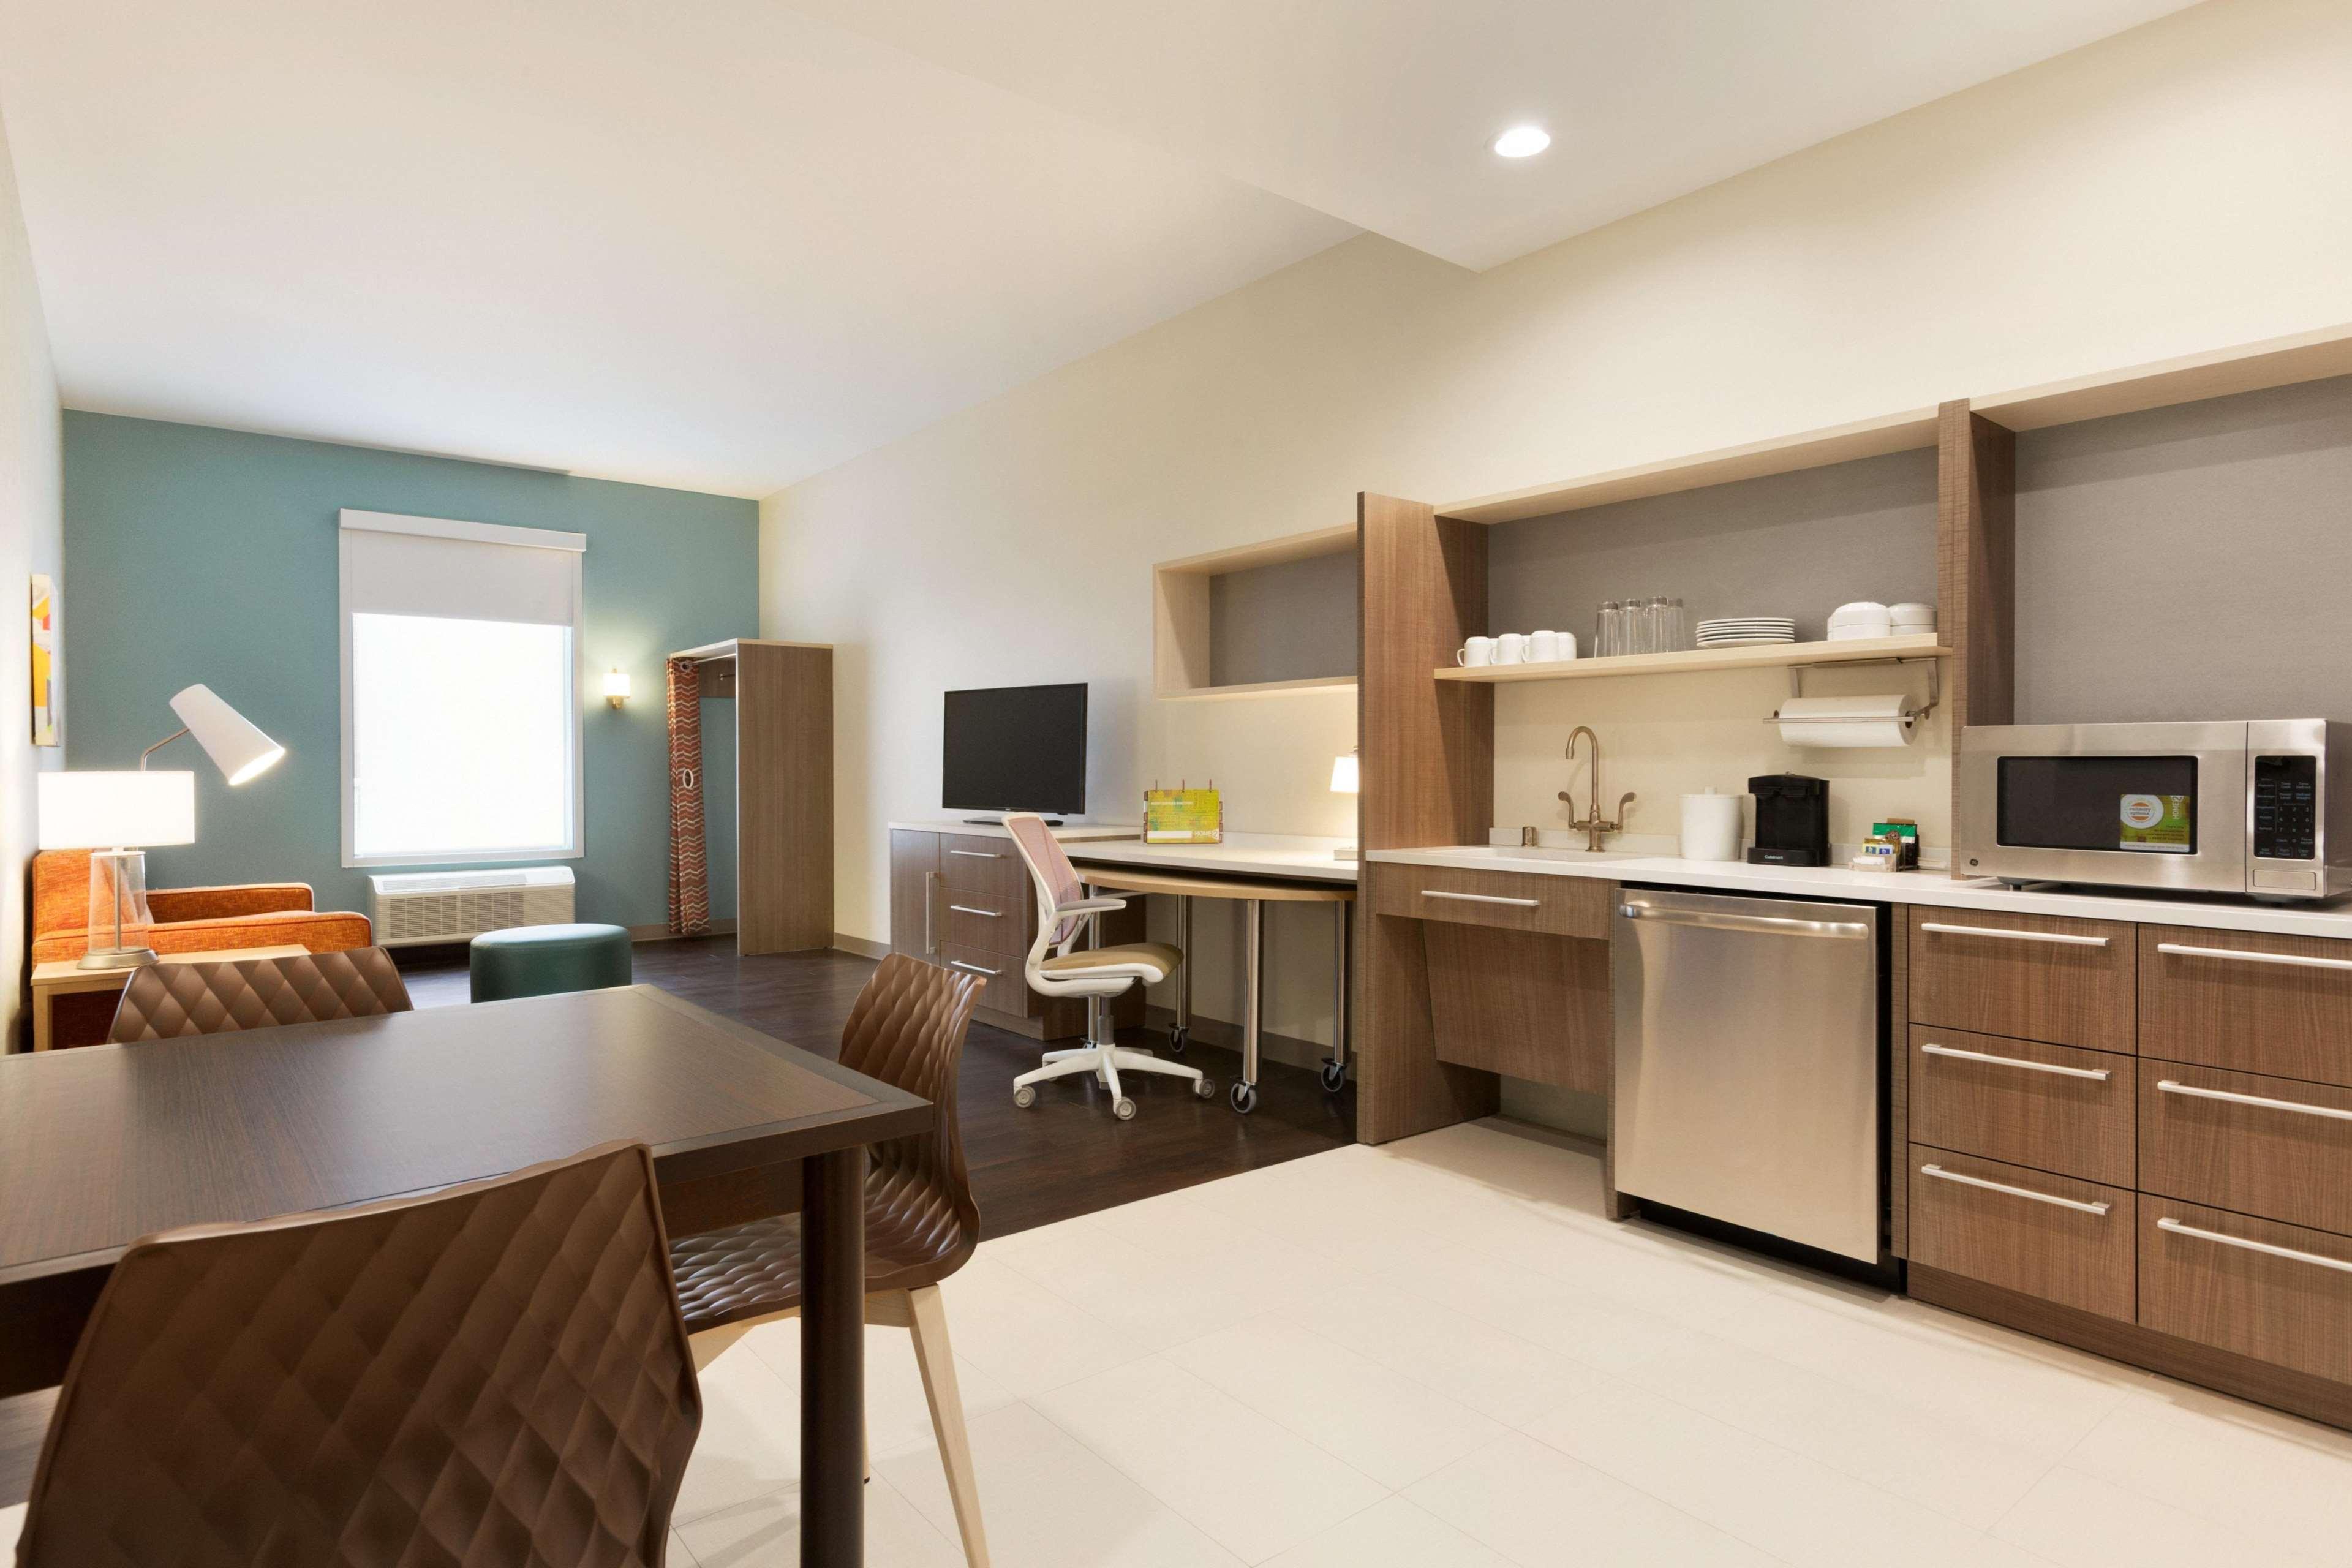 Home2 Suites by Hilton Florence Cincinnati Airport South image 20